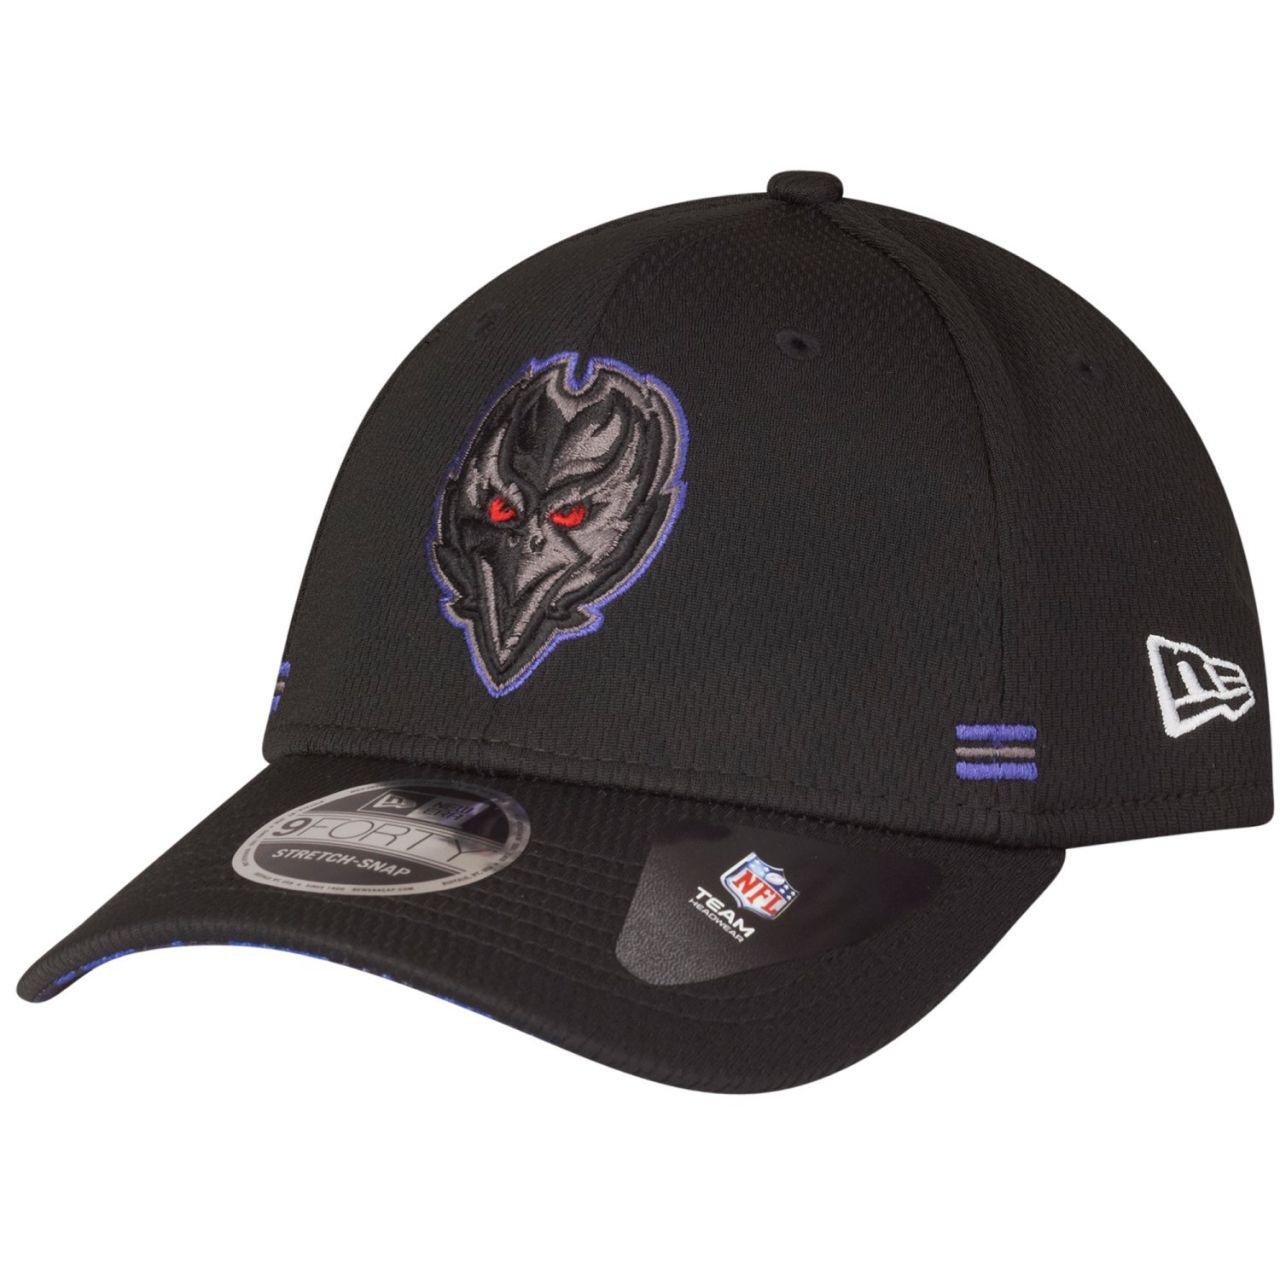 amfoo - New Era 9FORTY Stretch Snap Cap - HOMETOWN Baltimore Ravens